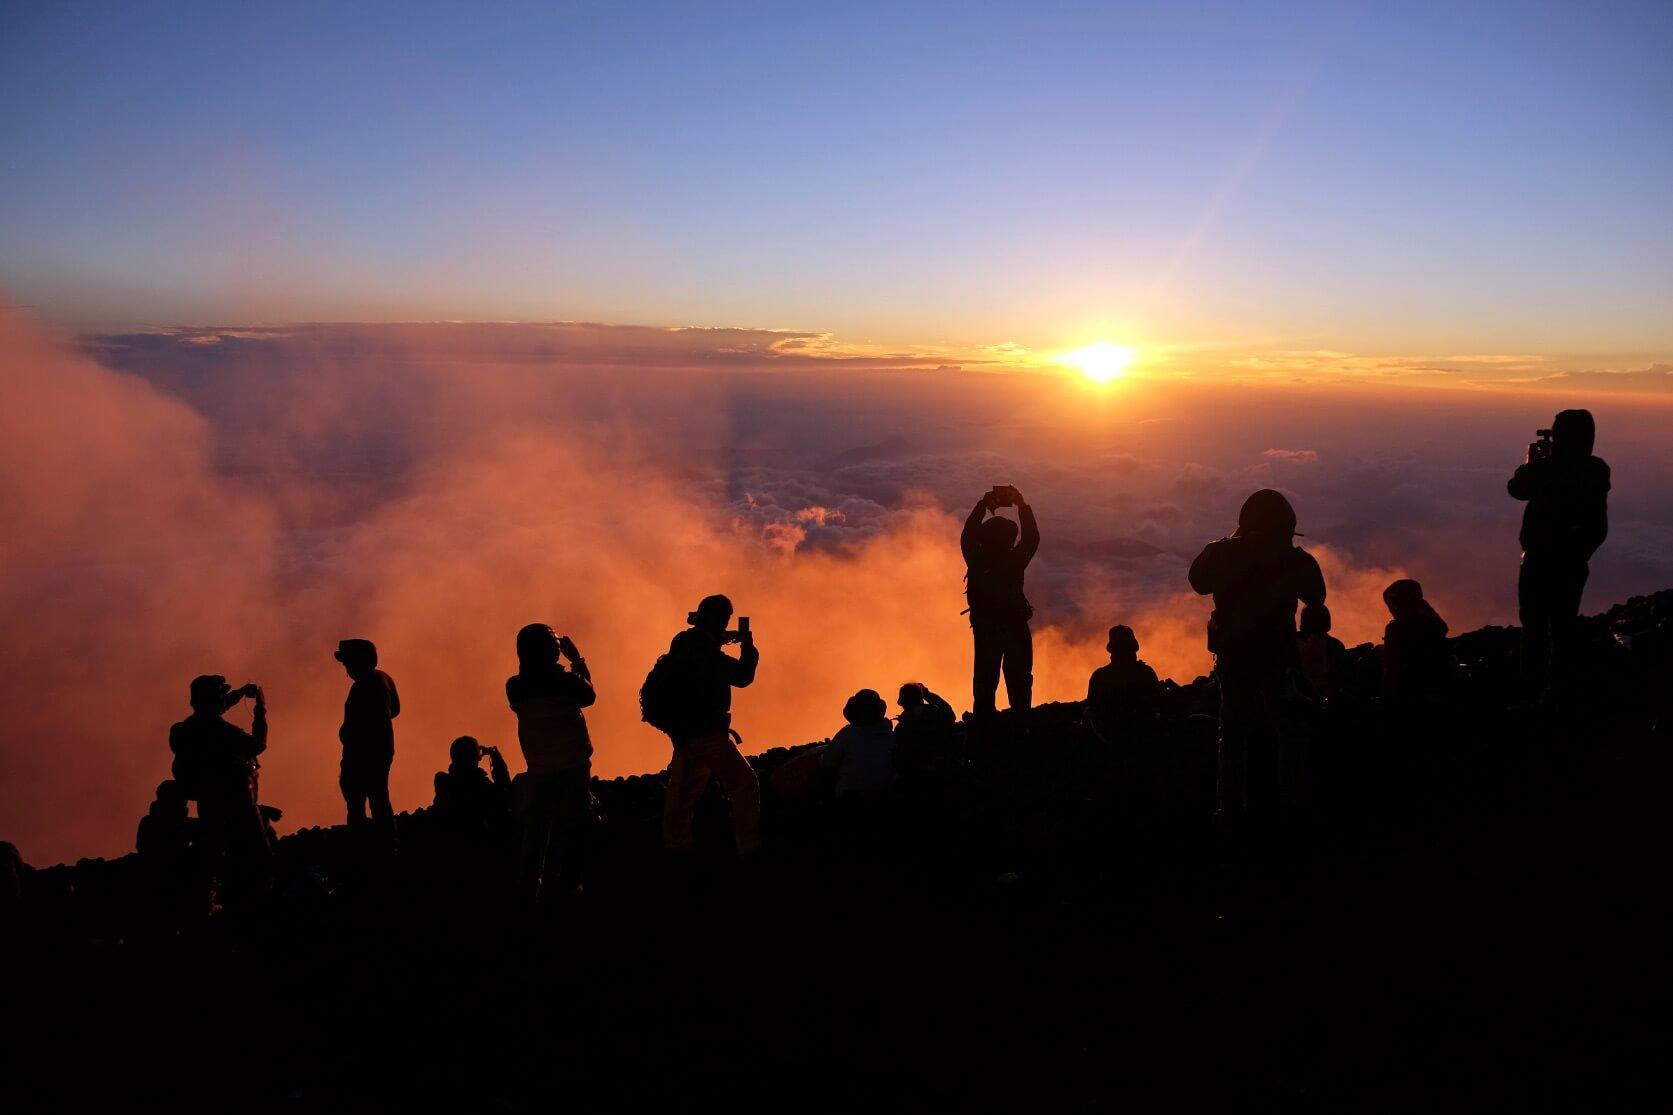 Sunrise from Mt. Fuji, Shizuoka